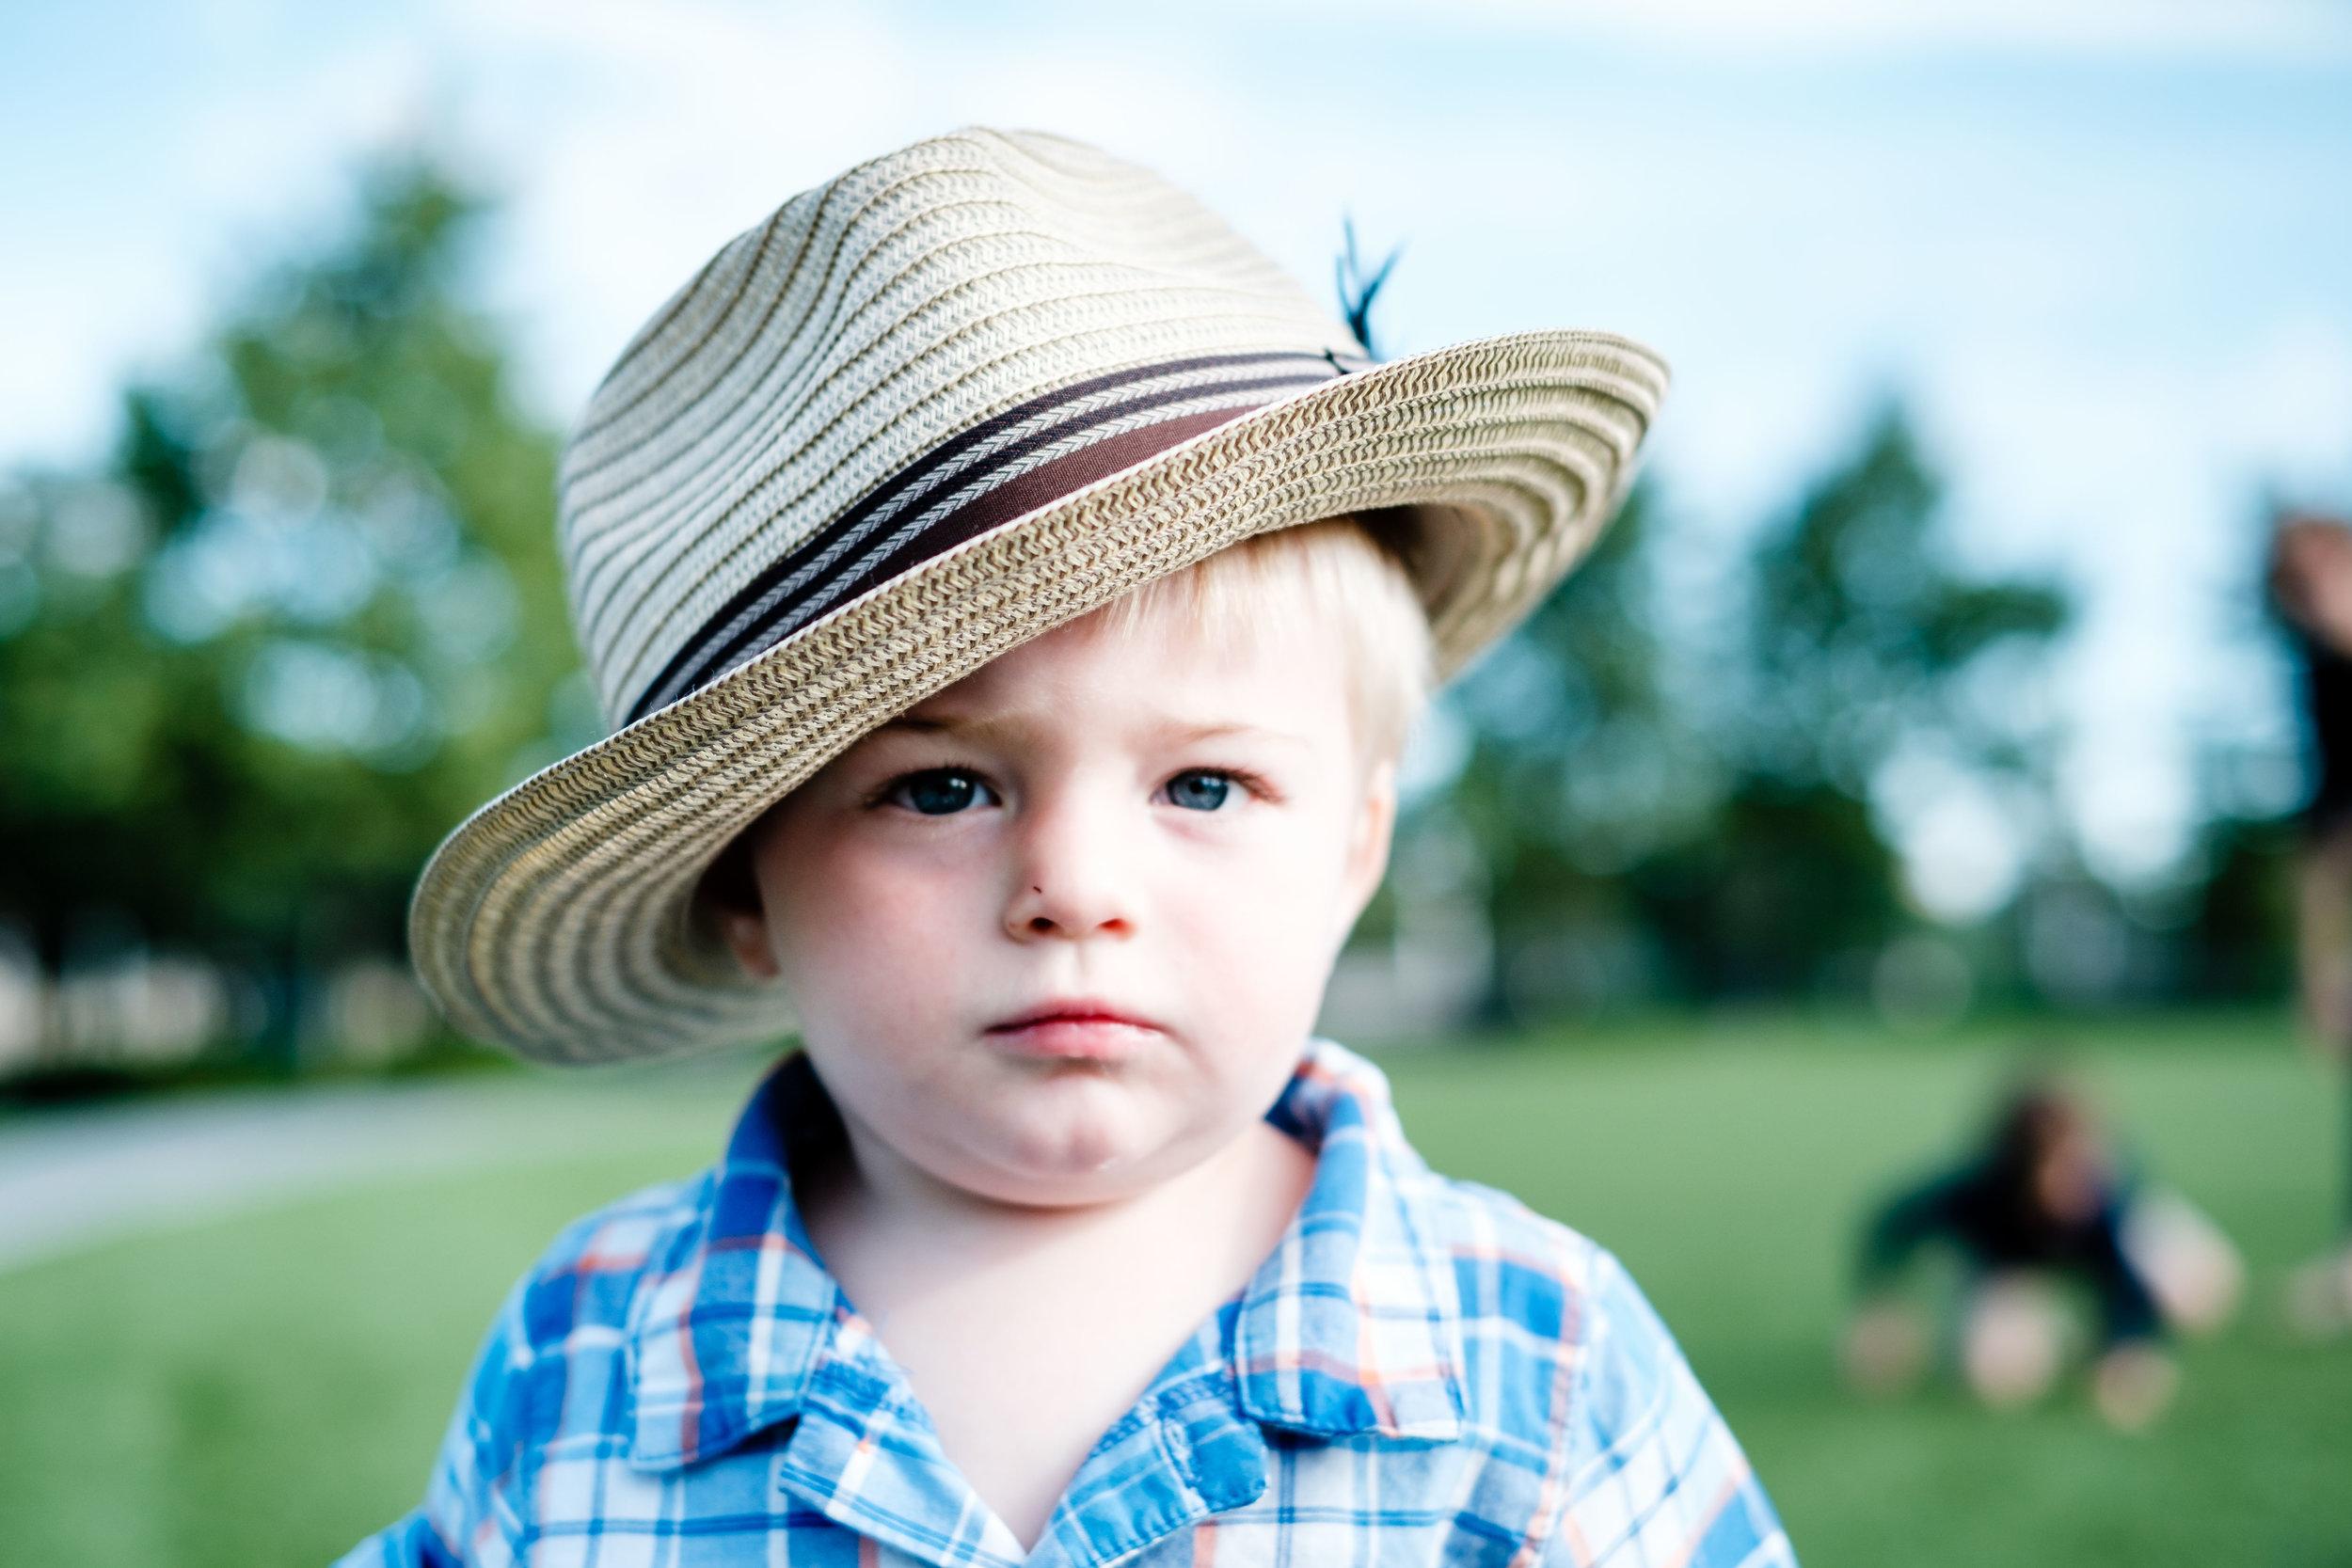 Little guy stole my hat